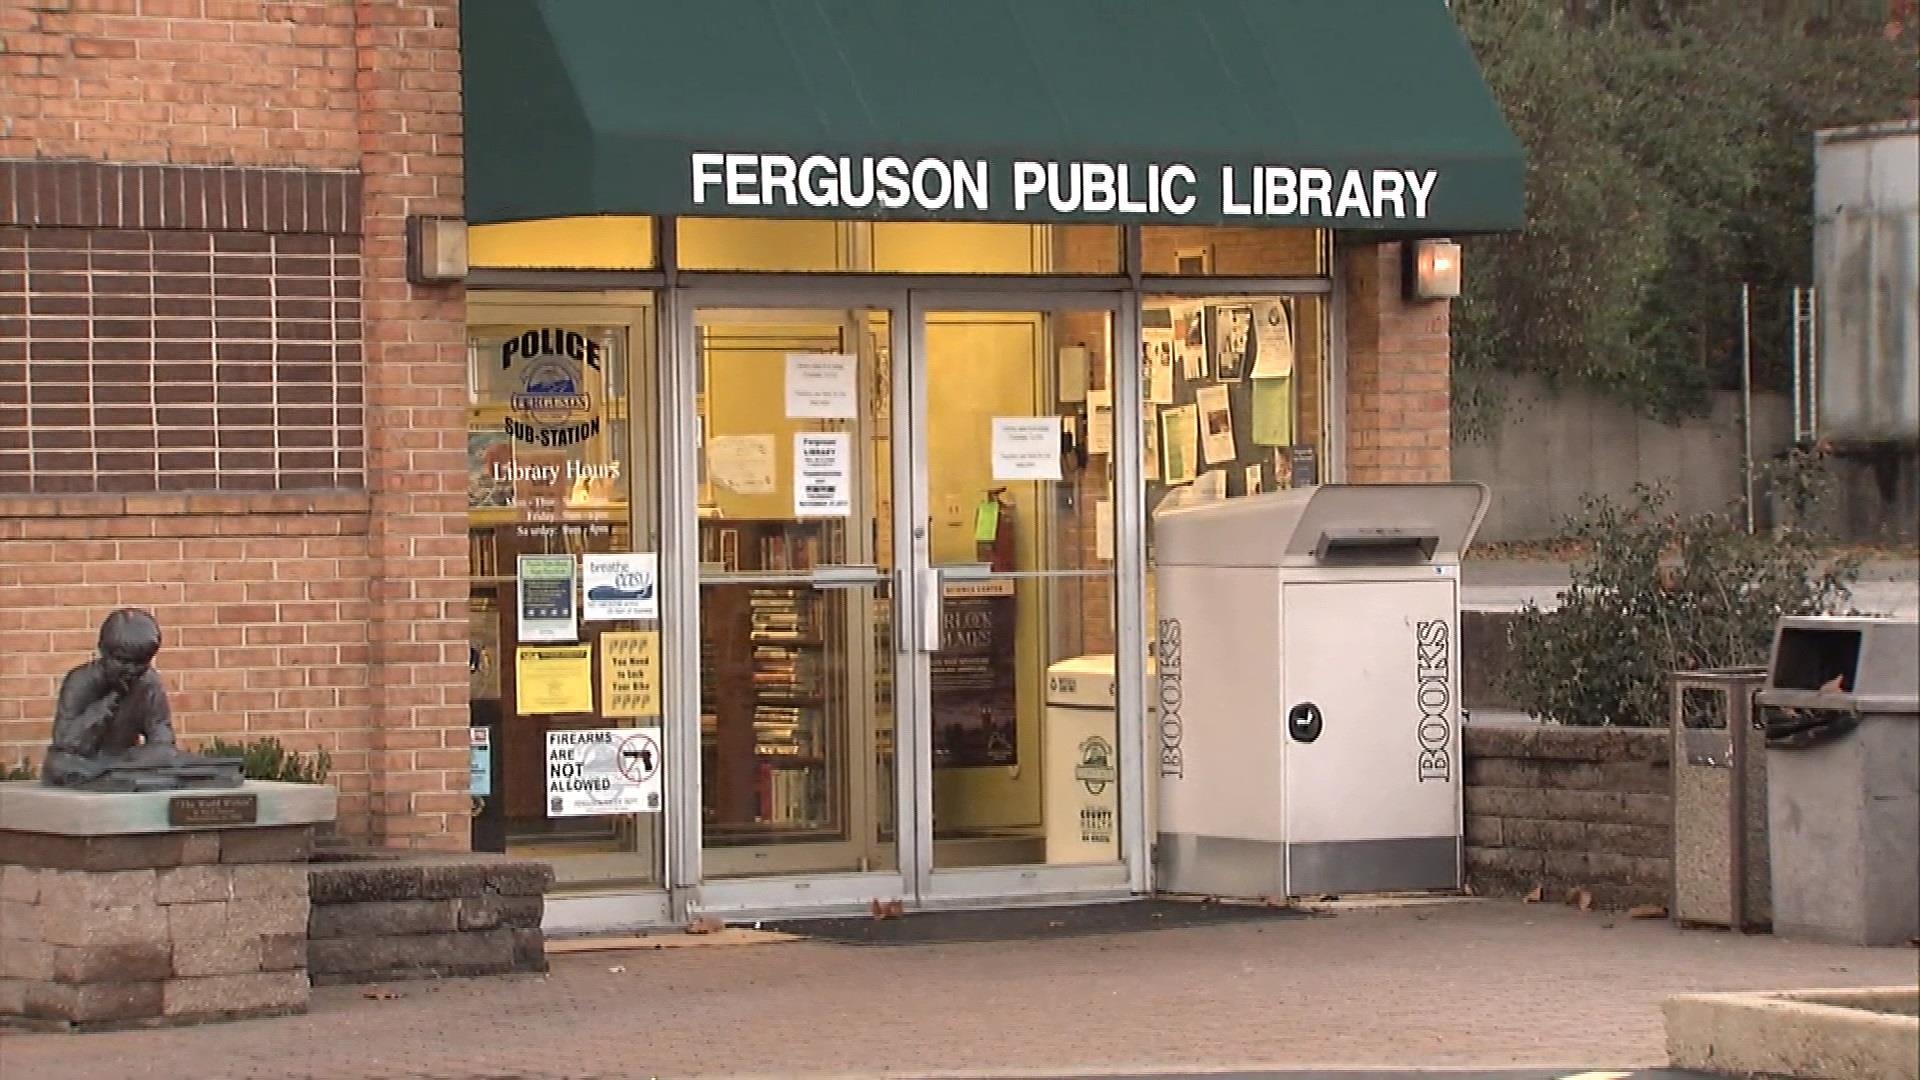 FergusonPublicLibrary